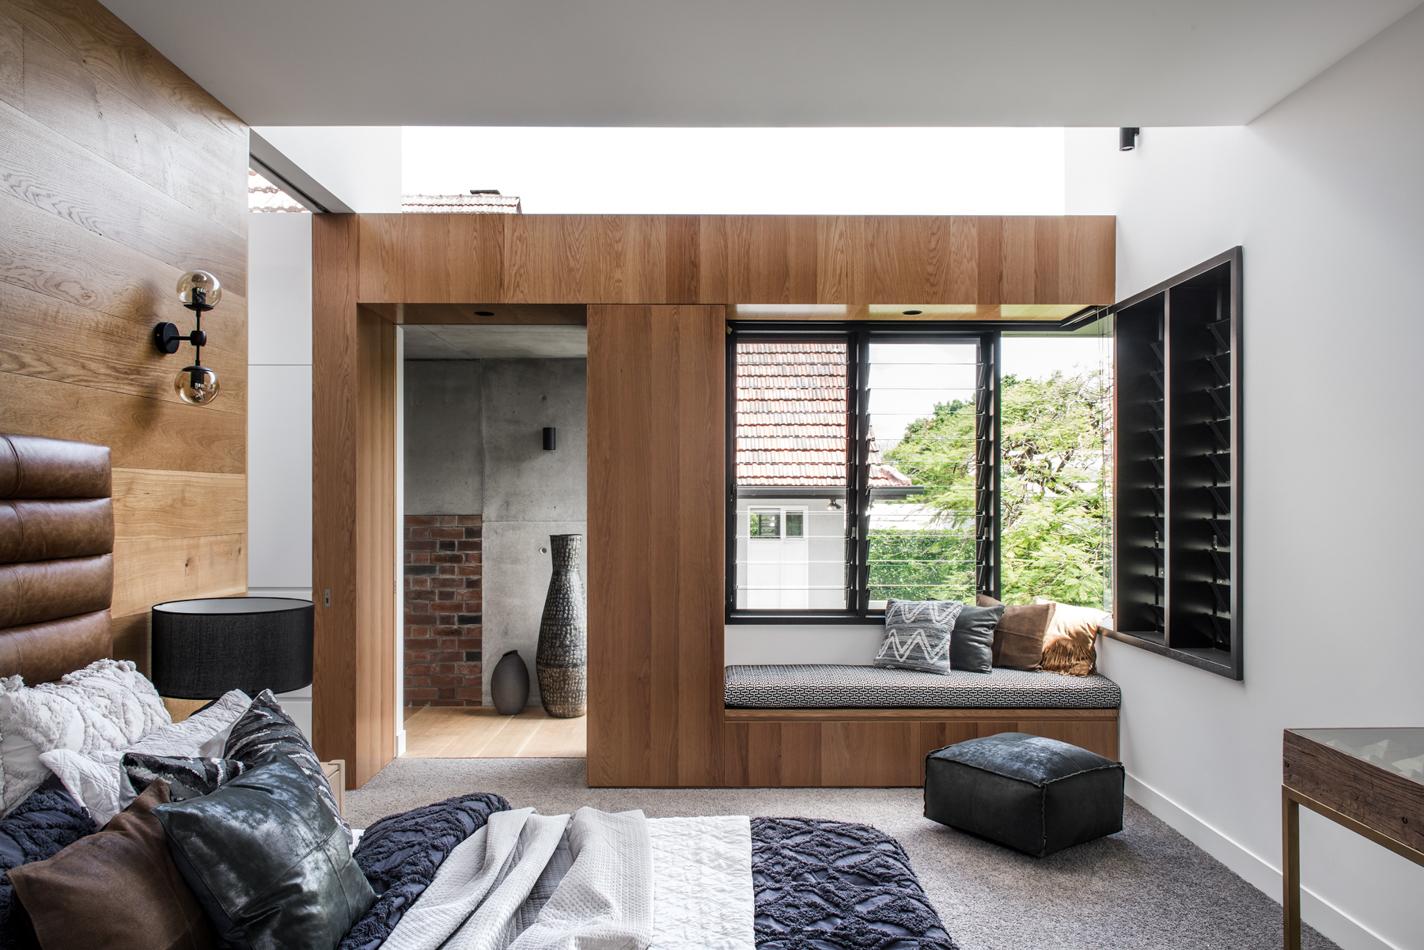 the-terrace-shaun-lockyer-architects-the-design-emotive-22.jpg